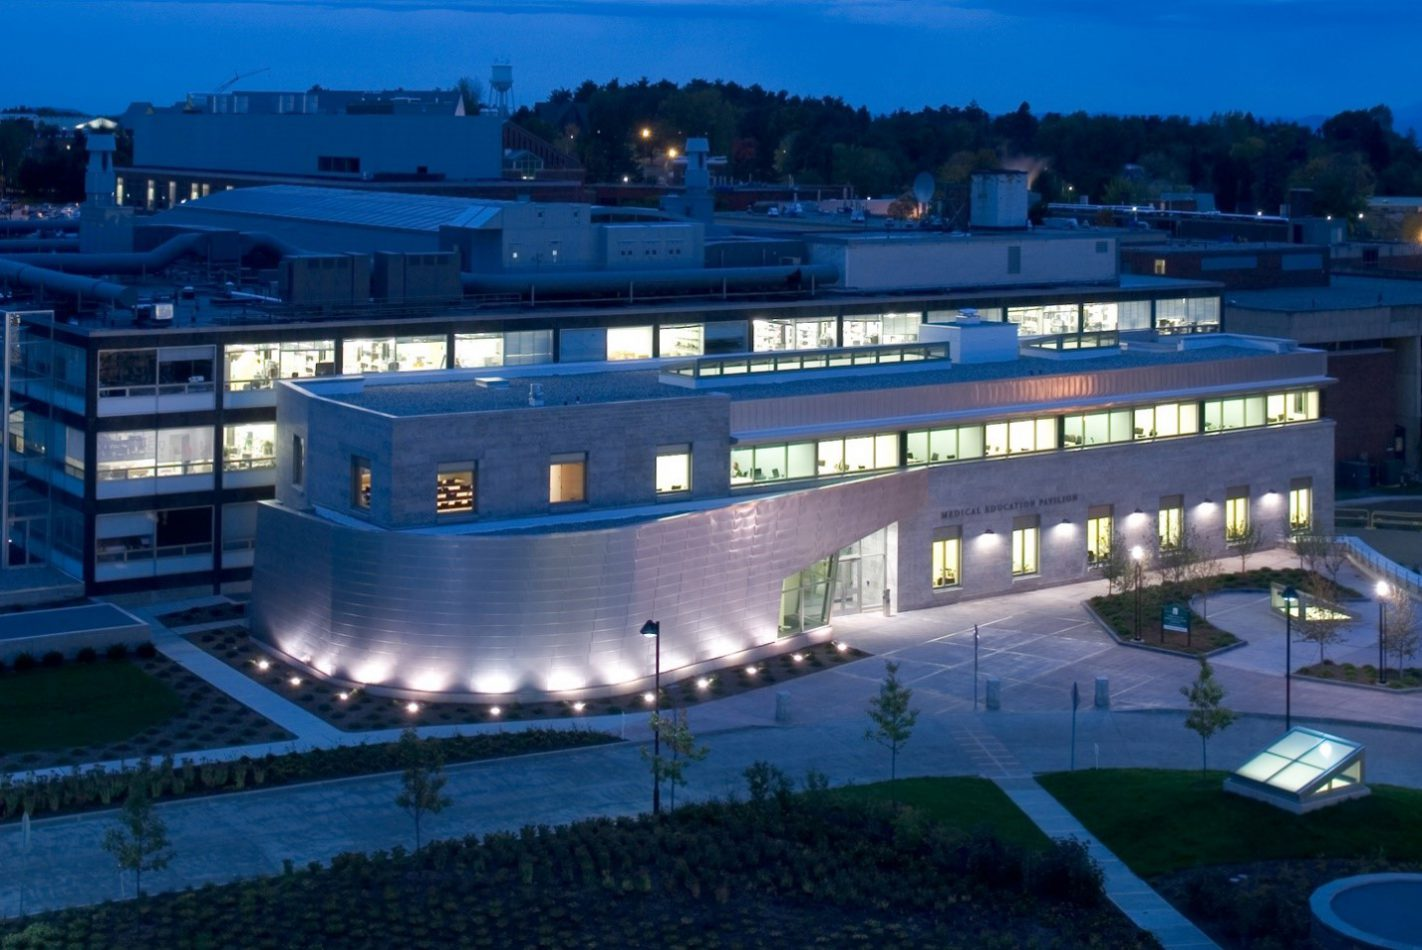 The Robert Larner College of Medicine